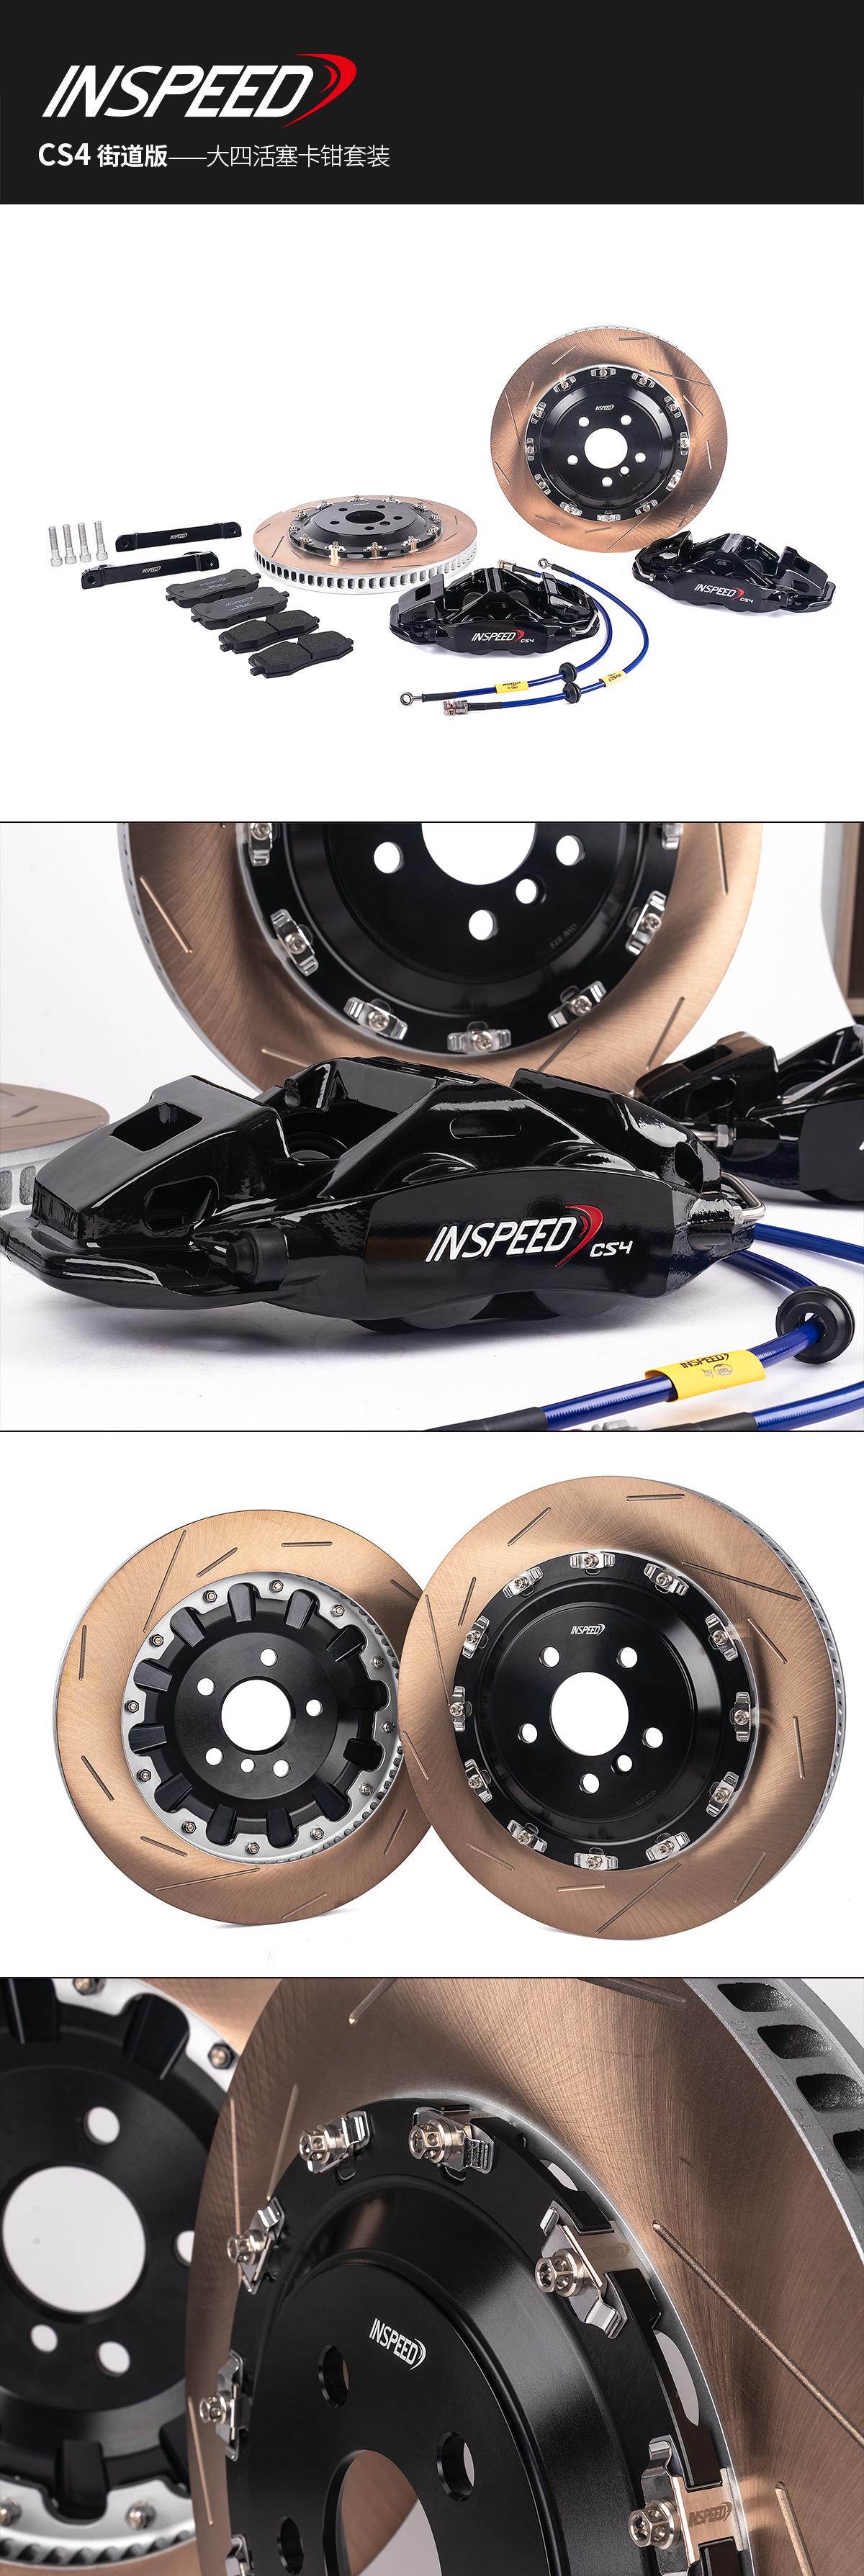 INSPEED硬速 CS4大四活塞高性能刹车套装